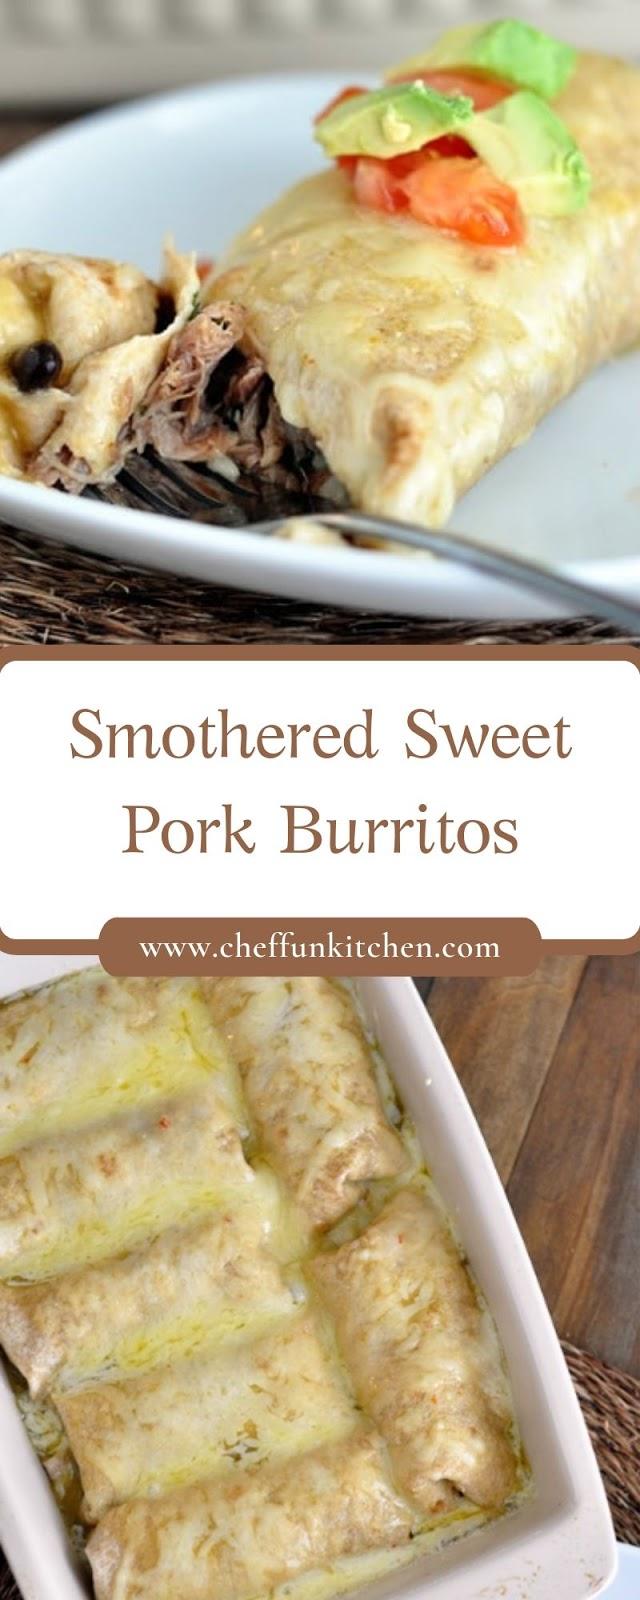 Smothered Sweet Pork Burritos